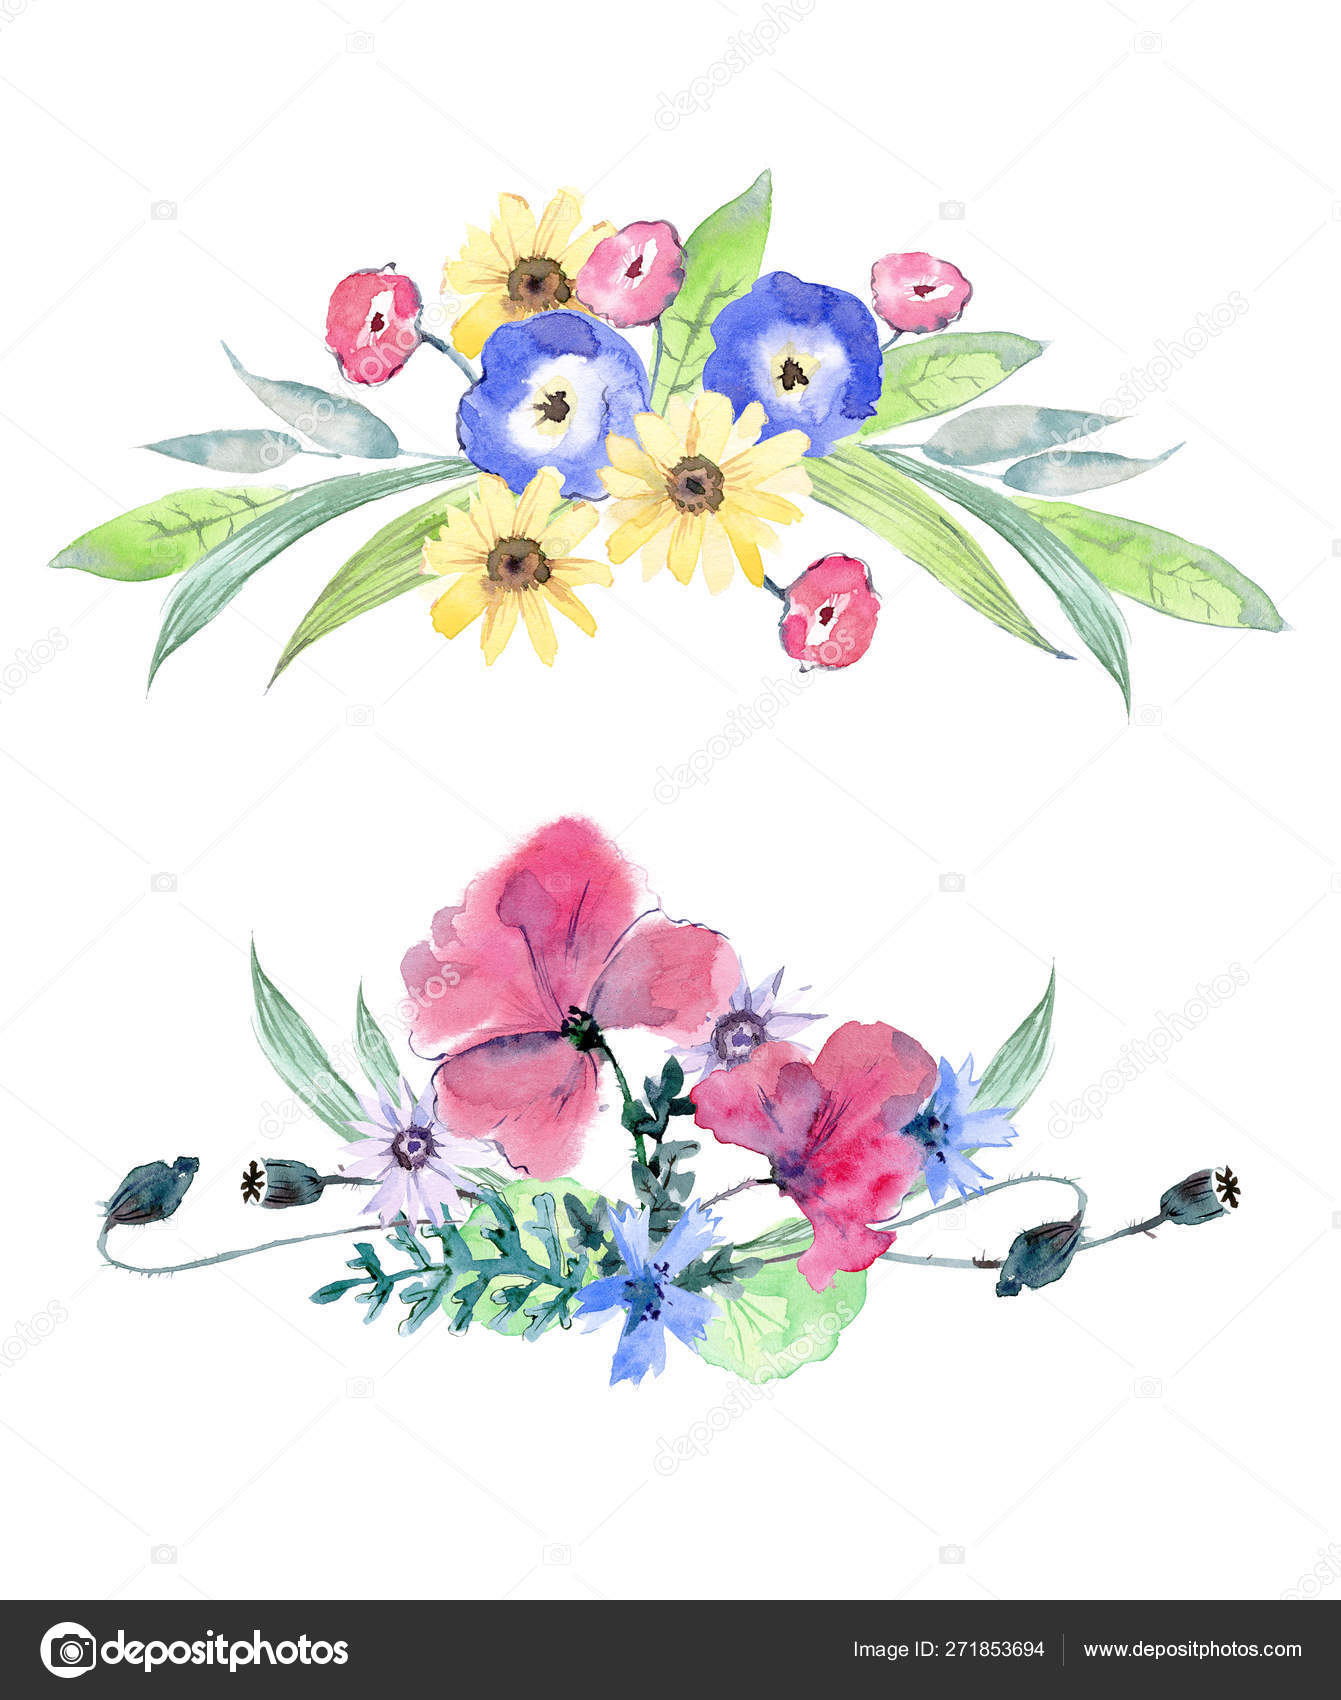 Watercolor Wildflowers Bouquet Pansies Calendula Cornflowers Poppies Daisies Greenery Horizontal Stock Photo C Dinkoobraz 271853694